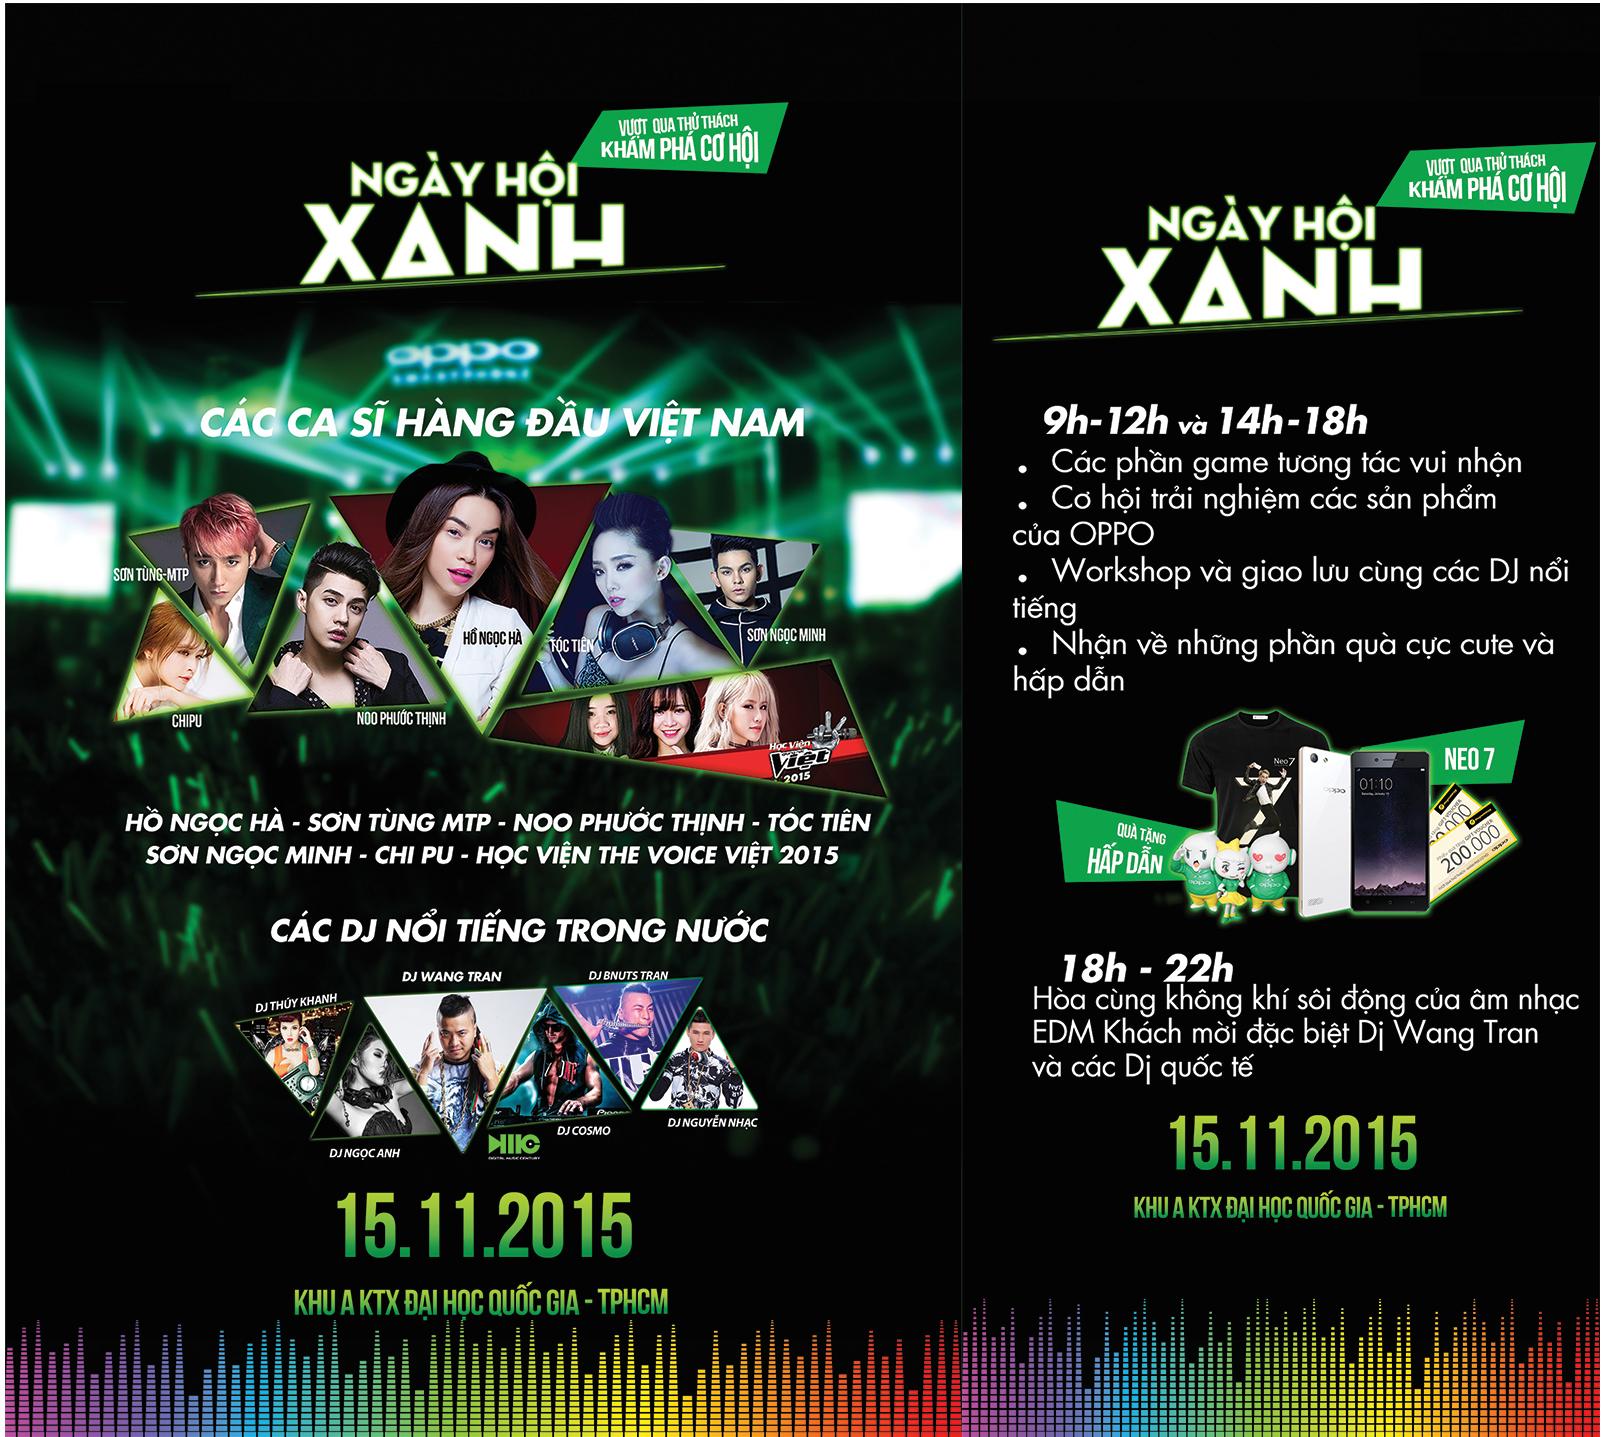 cac-loai-poster-marketing-hieu-qua-ve-mat-hinh-anh-cho-su-kien